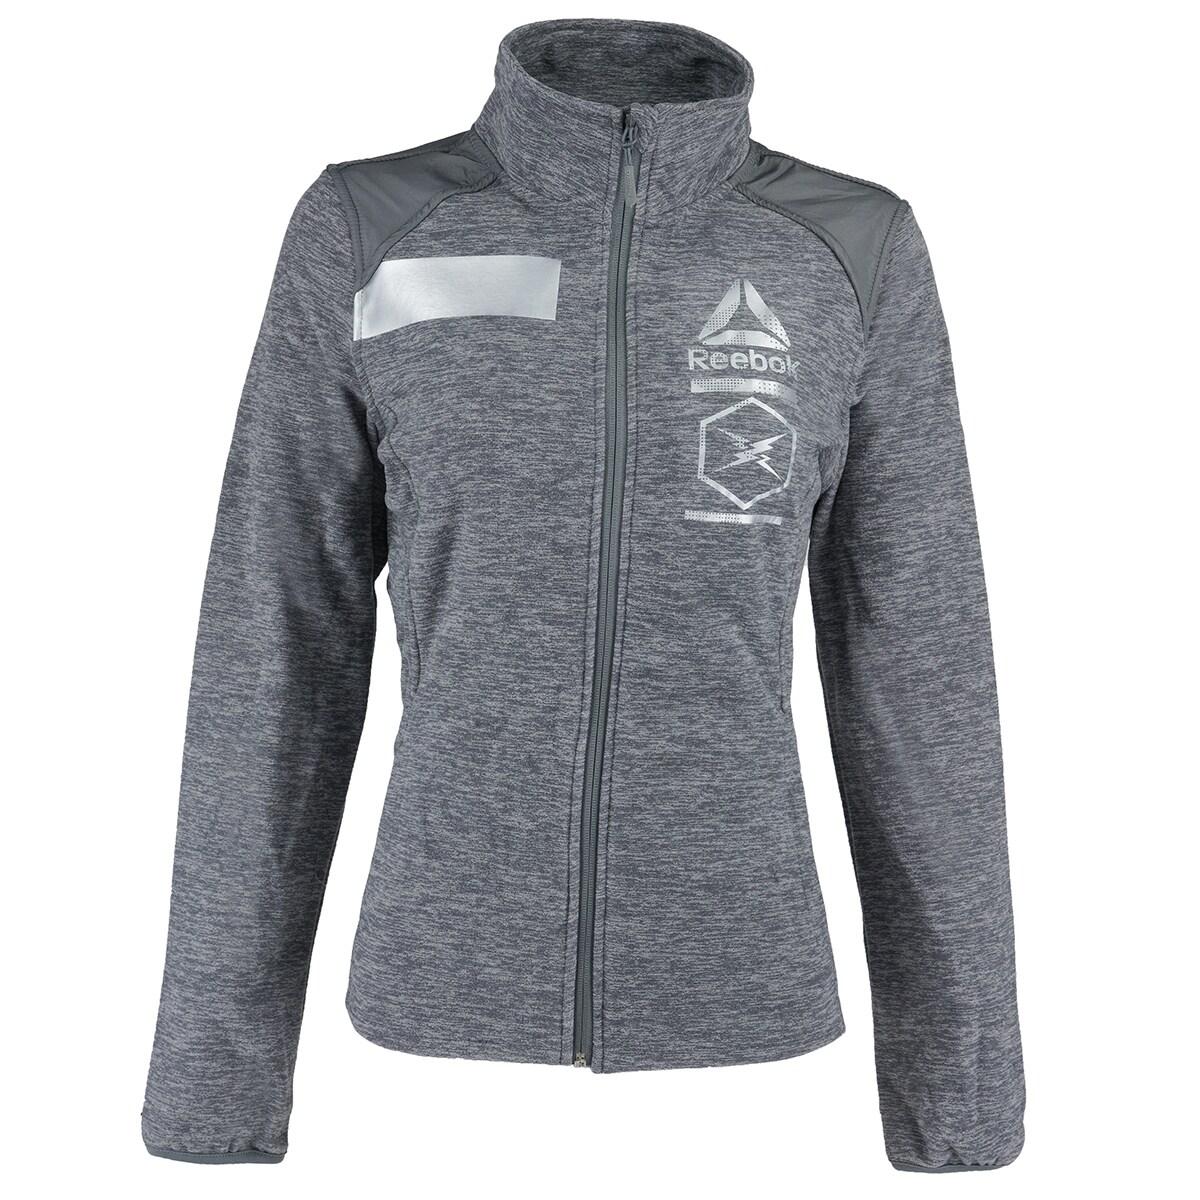 Reebok Women's Full Zip Polar Fleece Active Jacket Grey HeatherSilver M